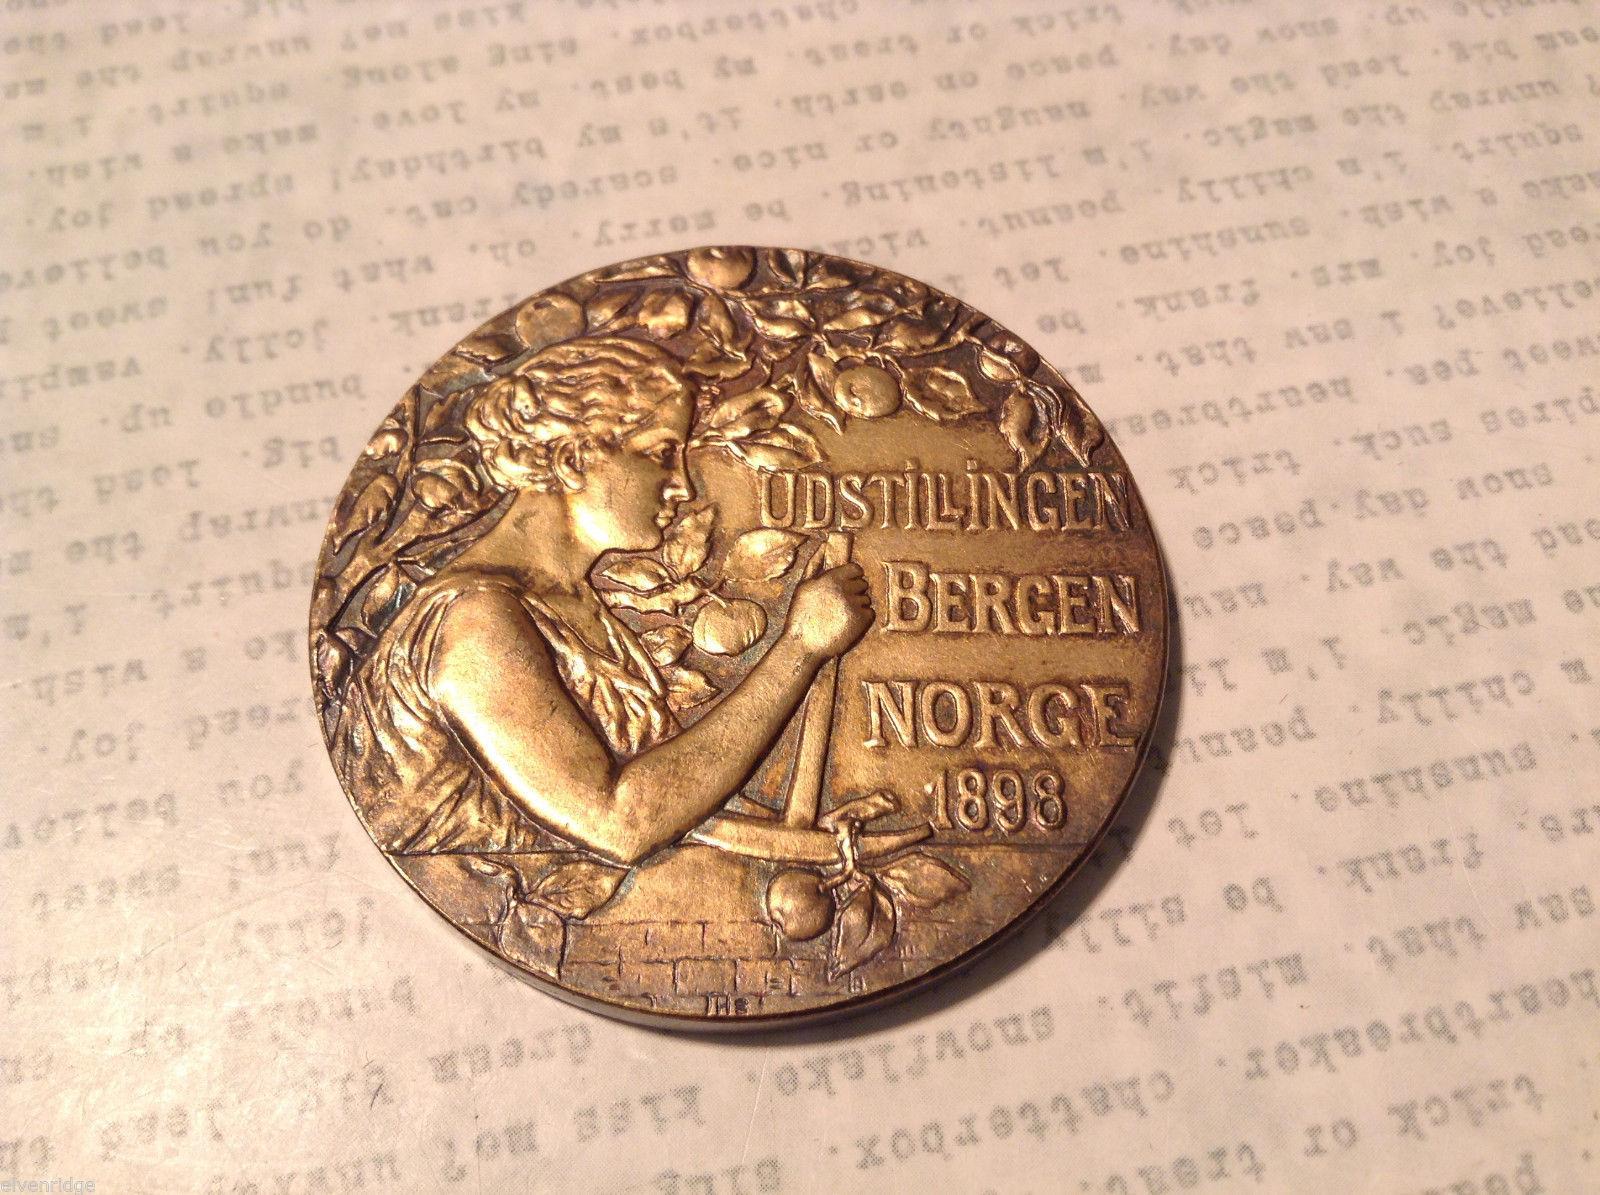 1898 Norway Udstillingen Bergen Norge Commemorative Bronze Medal Coin Rare